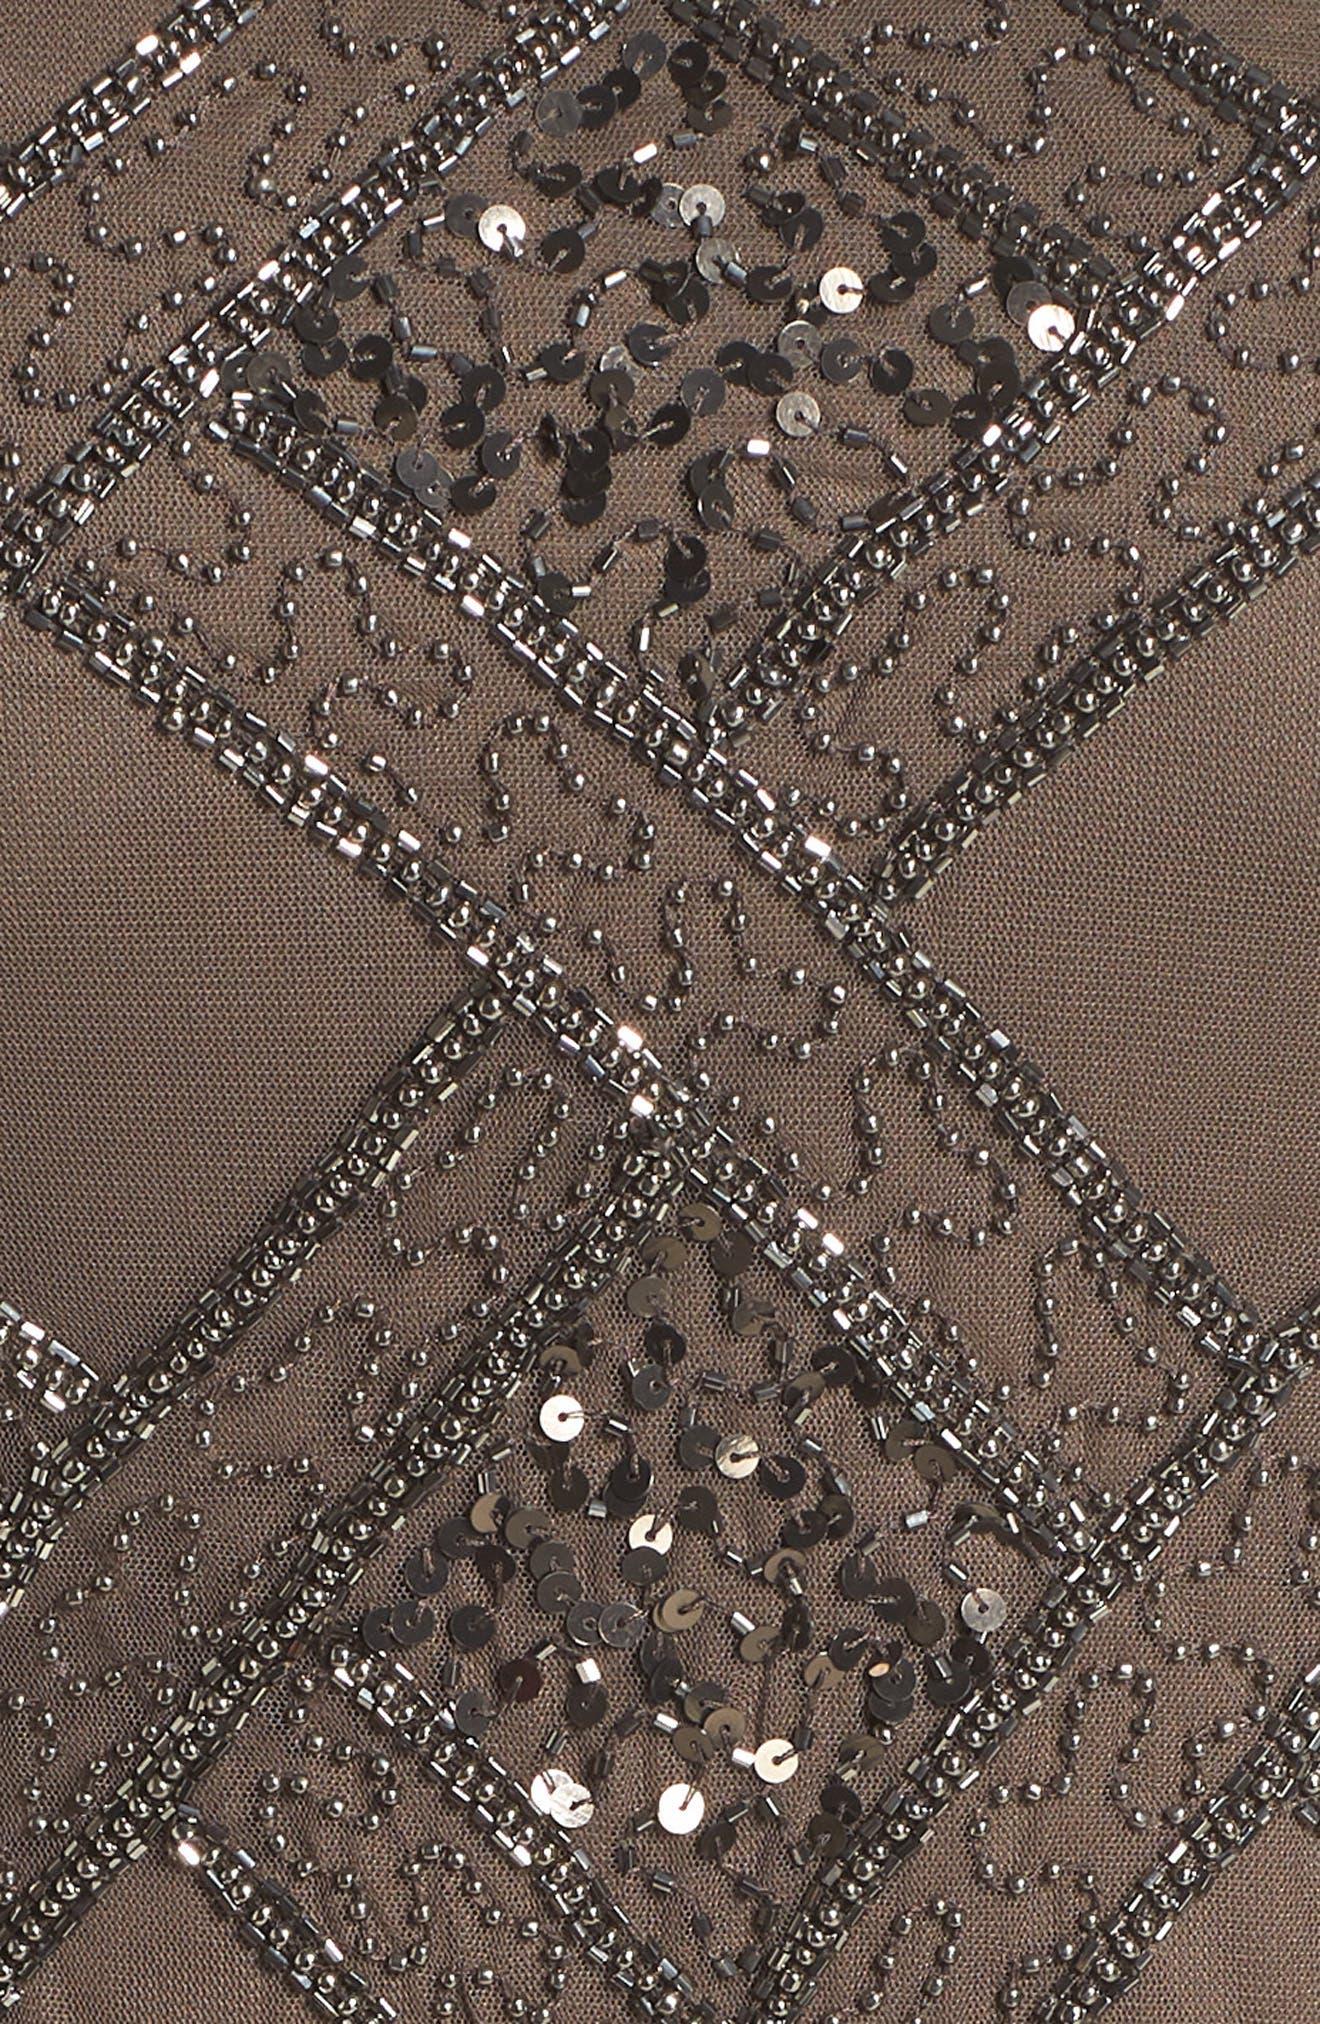 ADRIANNA PAPELL,                             Beaded Cap Sleeve Sheath Dress,                             Alternate thumbnail 5, color,                             050